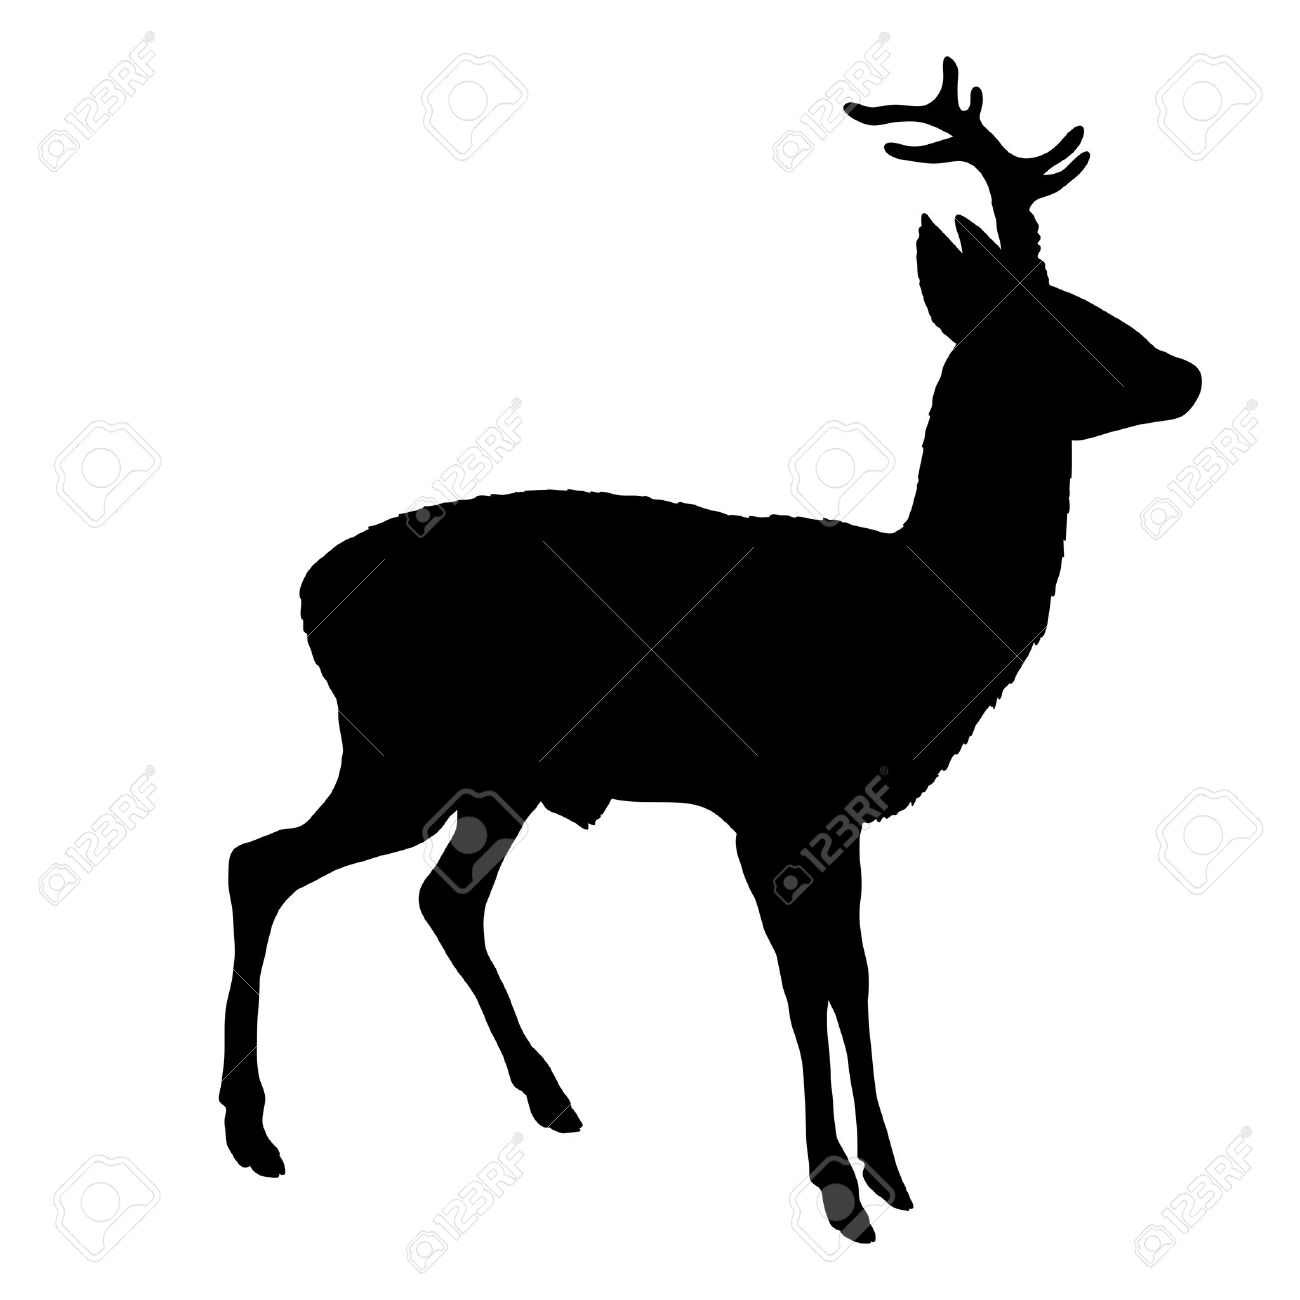 roe deer silhouette royalty free cliparts vectors and stock rh 123rf com deer head silhouette free vector deer family silhouette vector